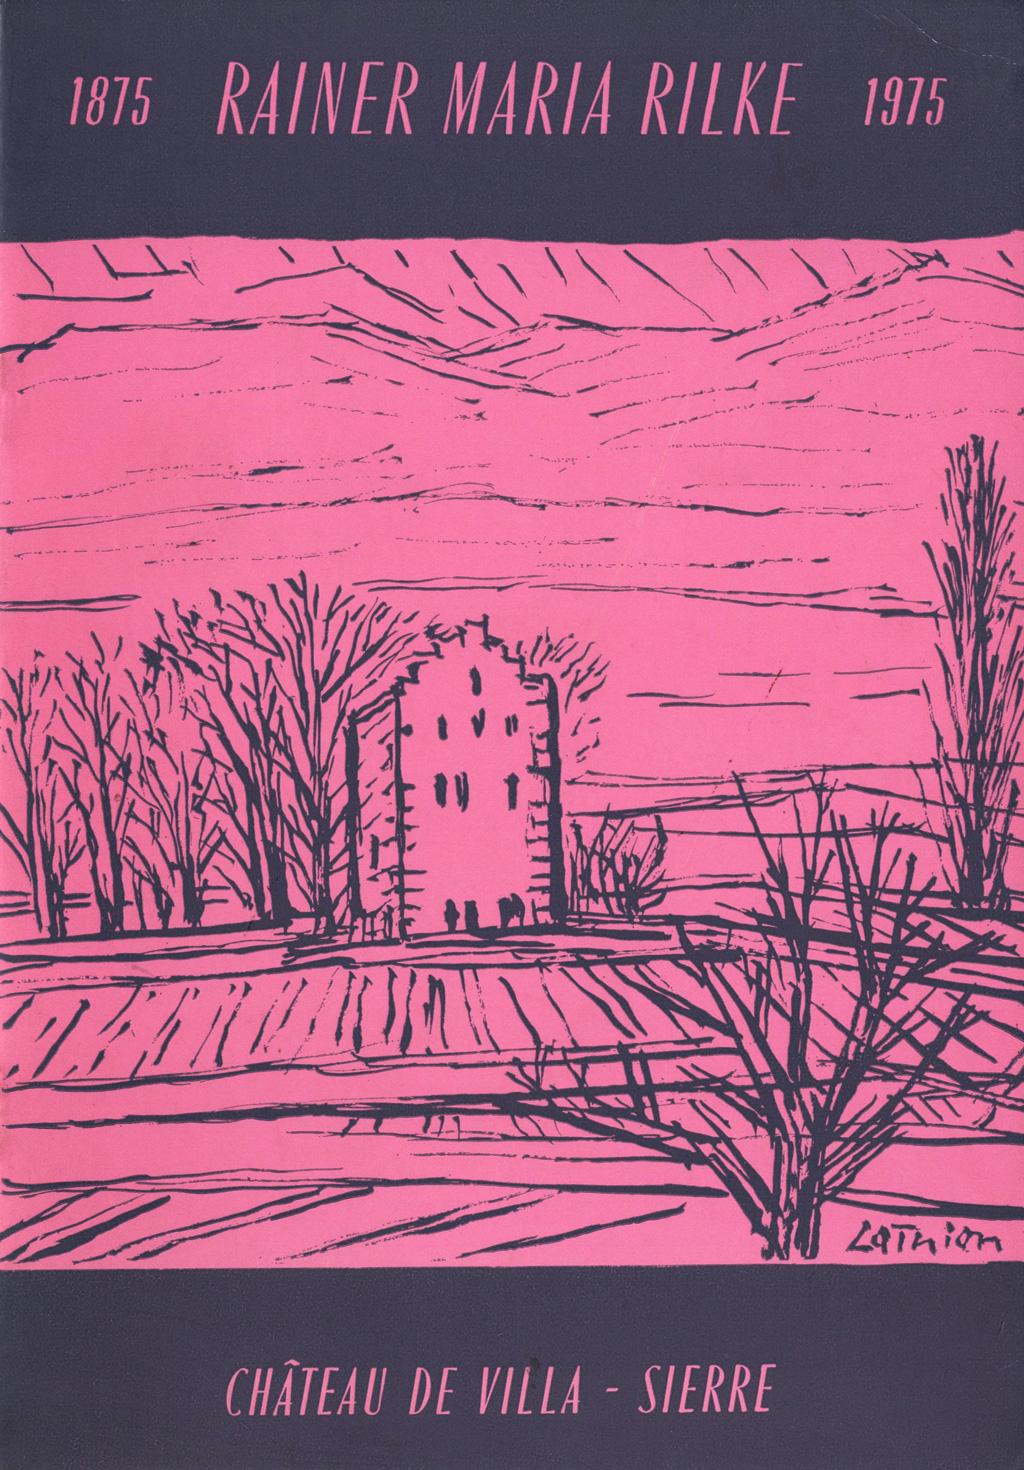 Hundertster Geburtstag von Rilke, 1975